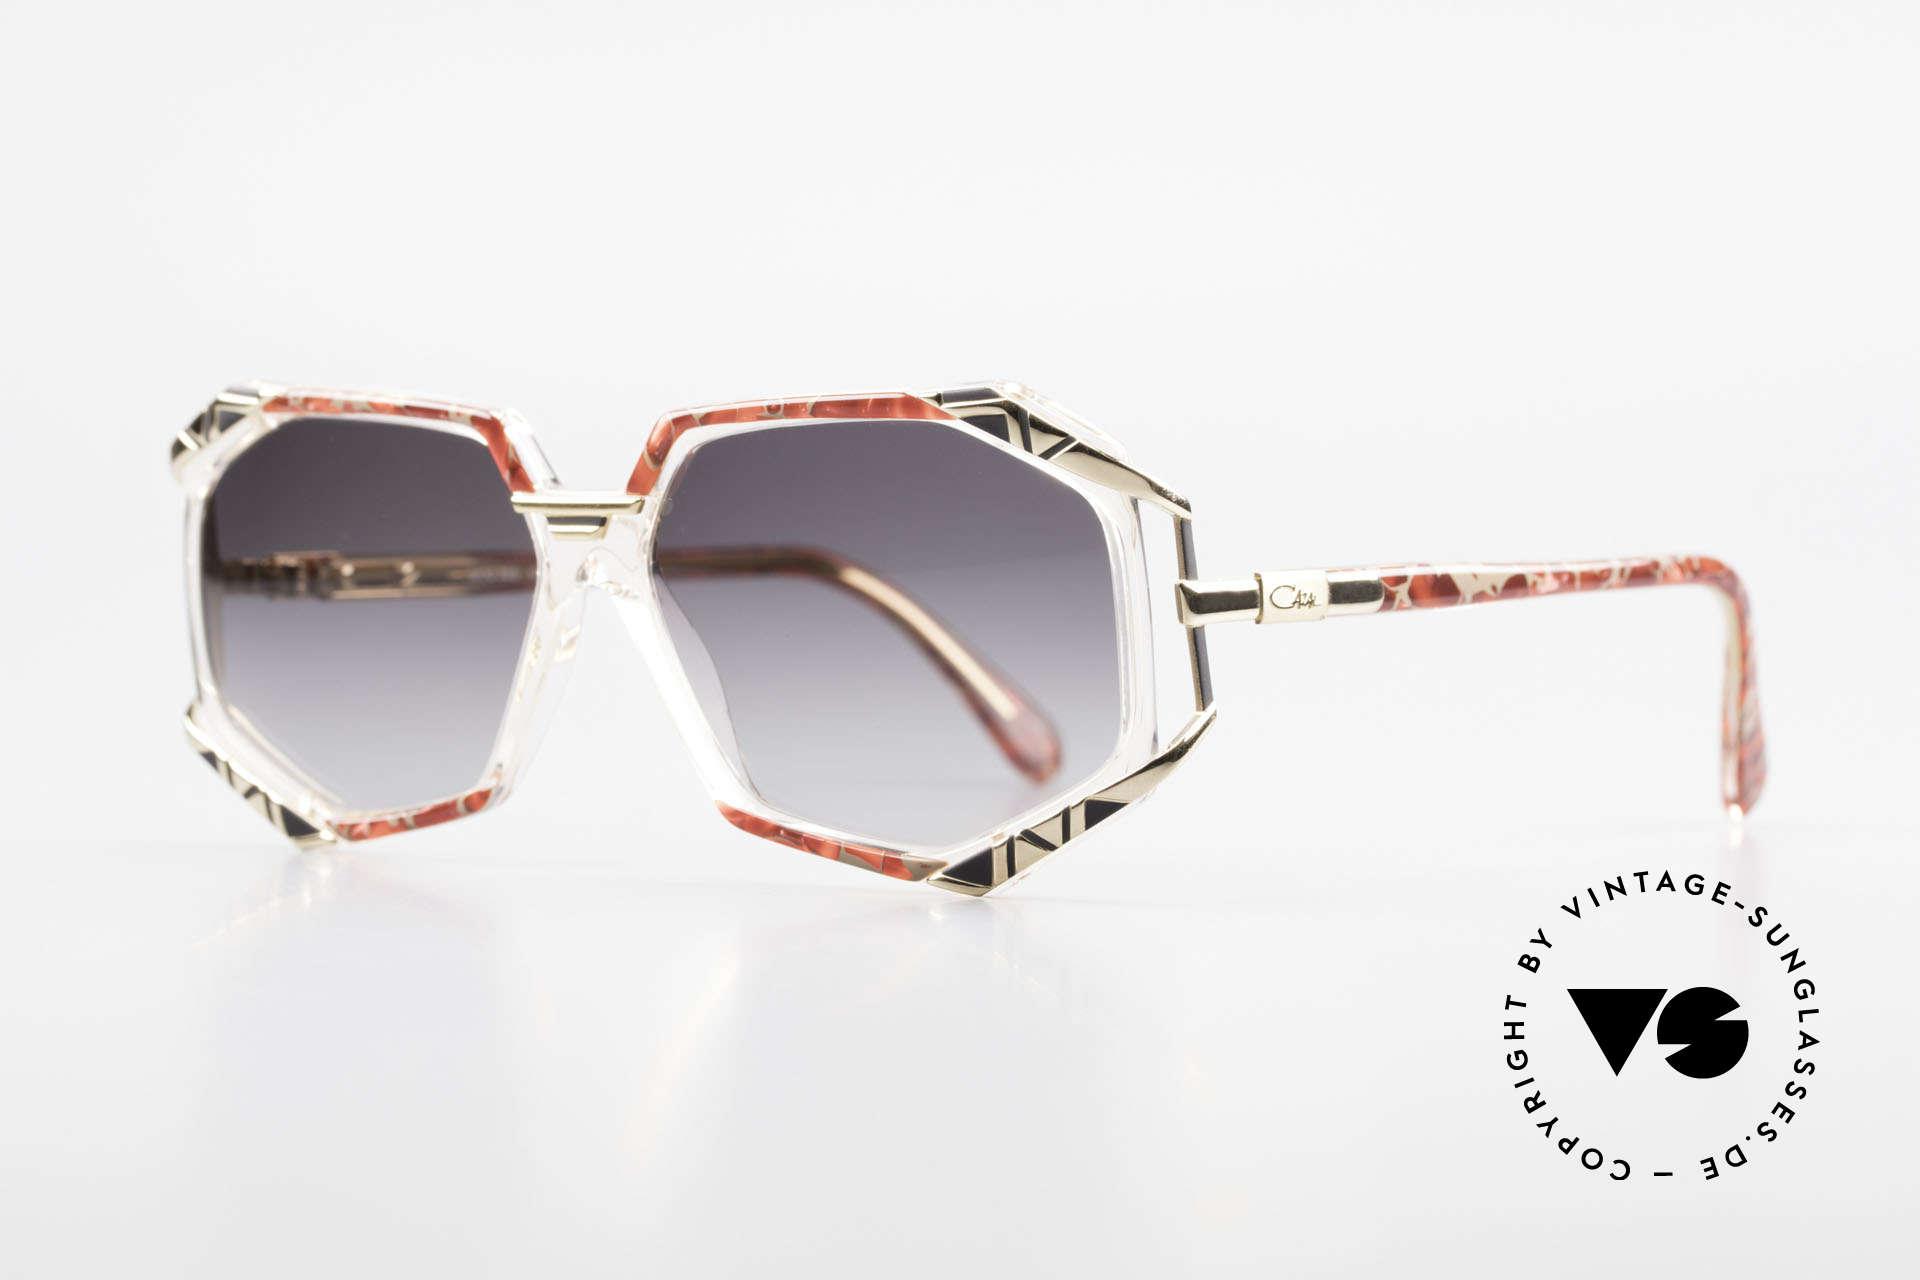 Cazal 355 Spectacular Cazal Sunglasses, terrific frame pattern by CAri ZALloni (check the pics!), Made for Women